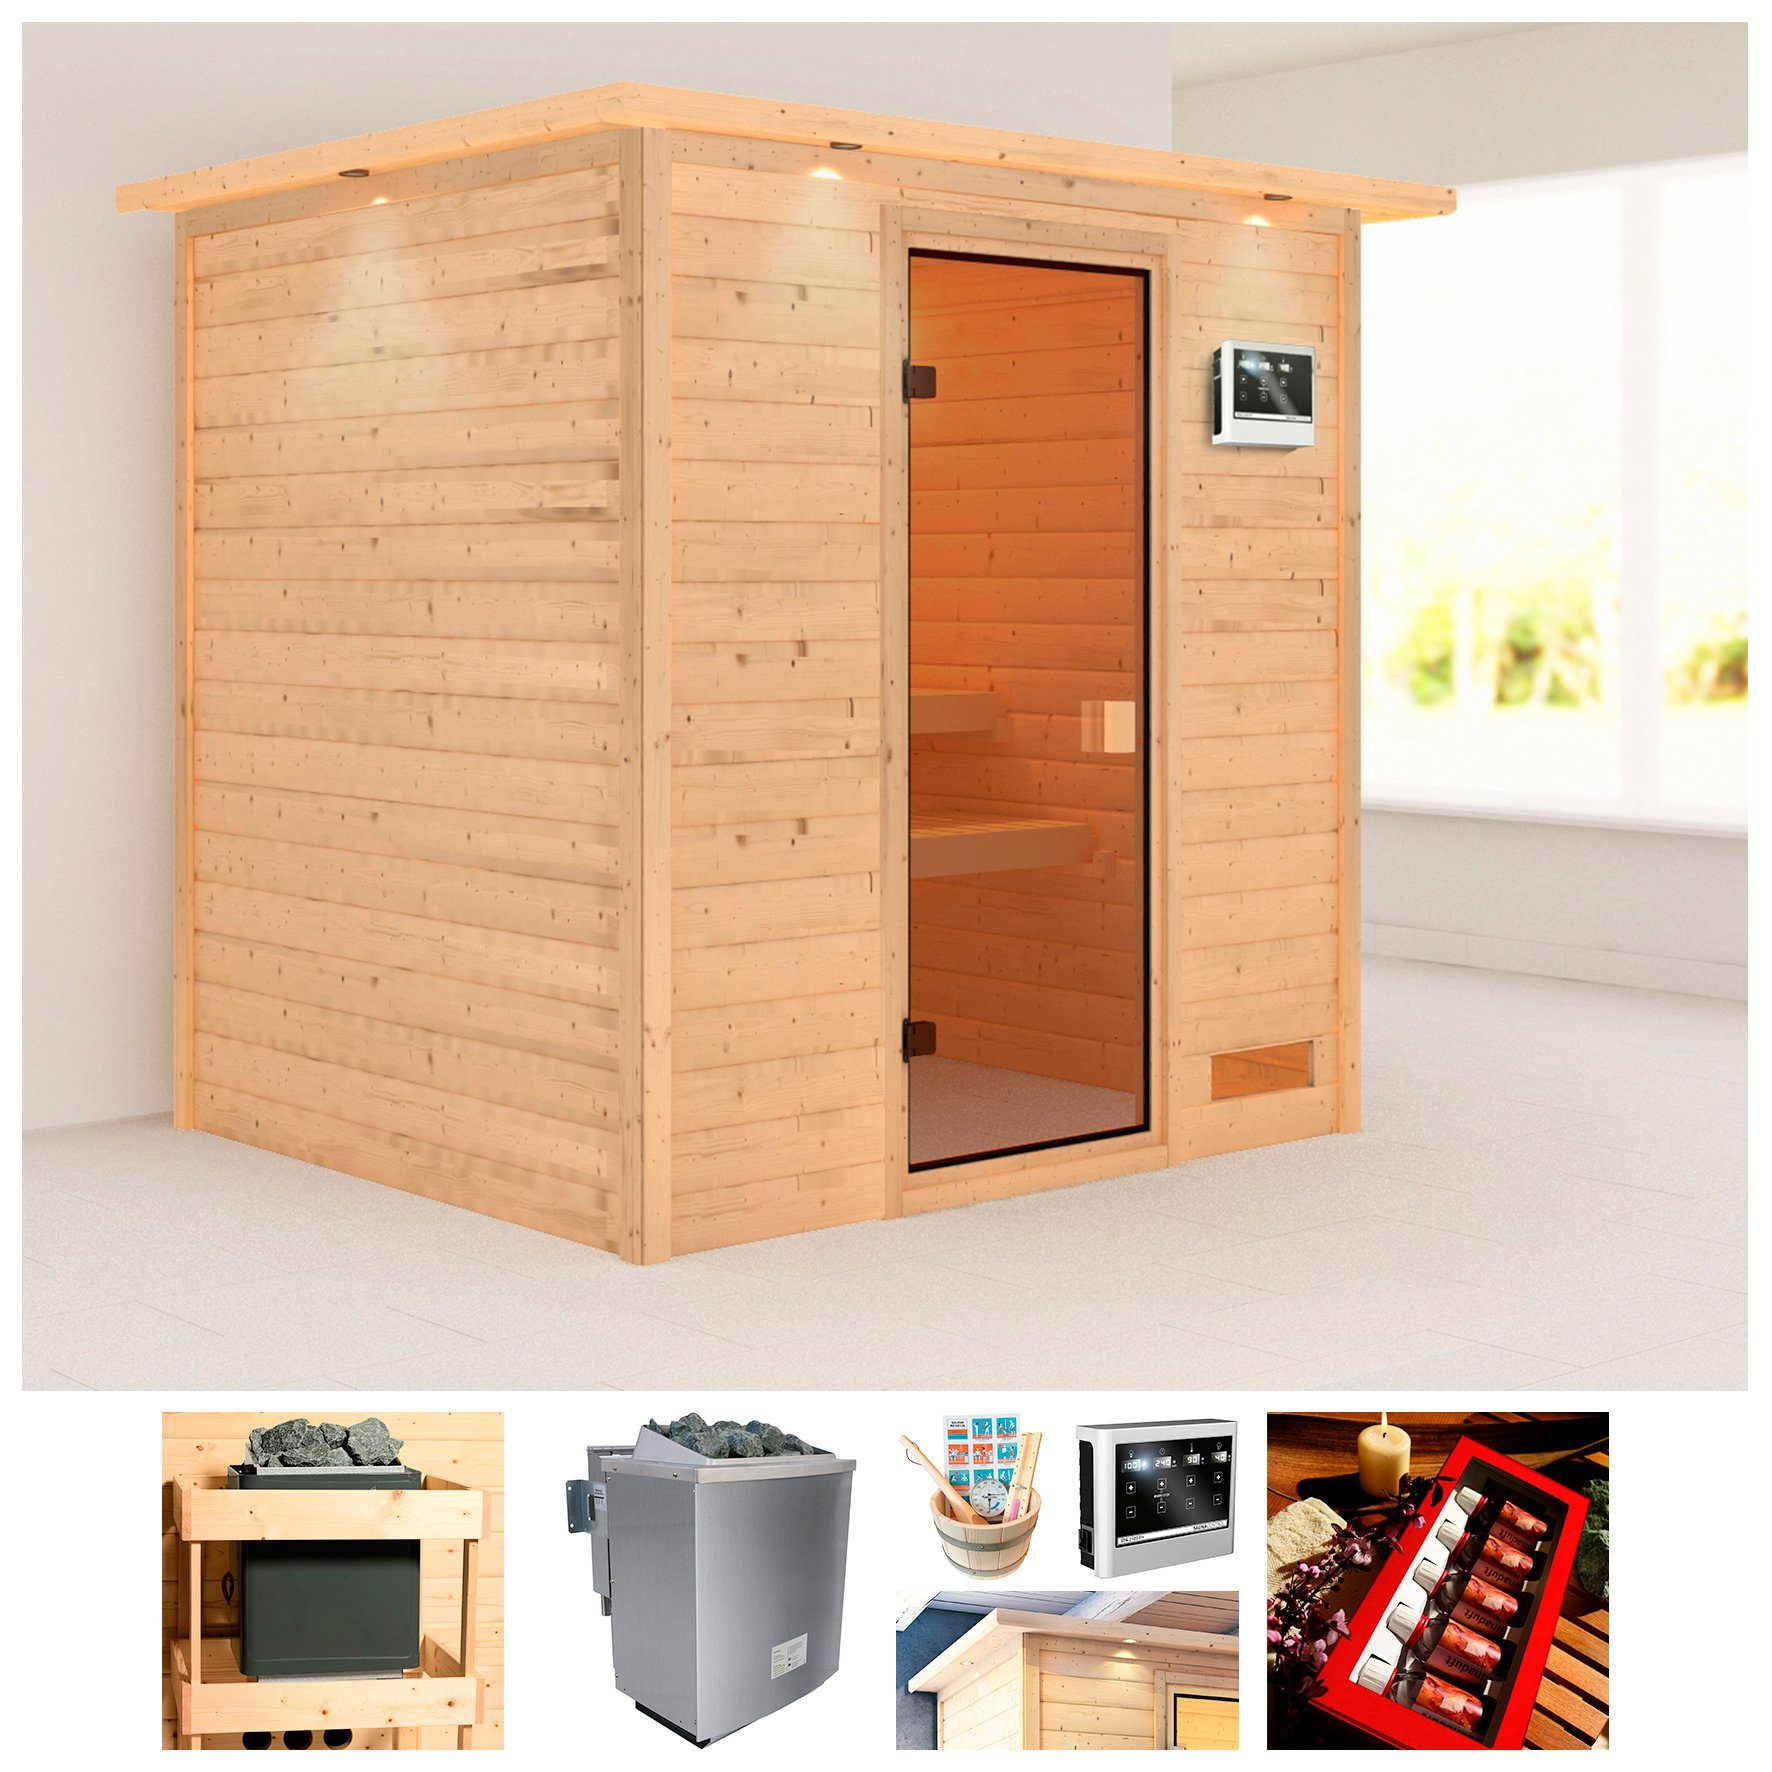 KARIBU Sauna »Wangerooge«, BxTxH: 224x184x191 cm, 9 kW Ofen mit ext. Steuerung